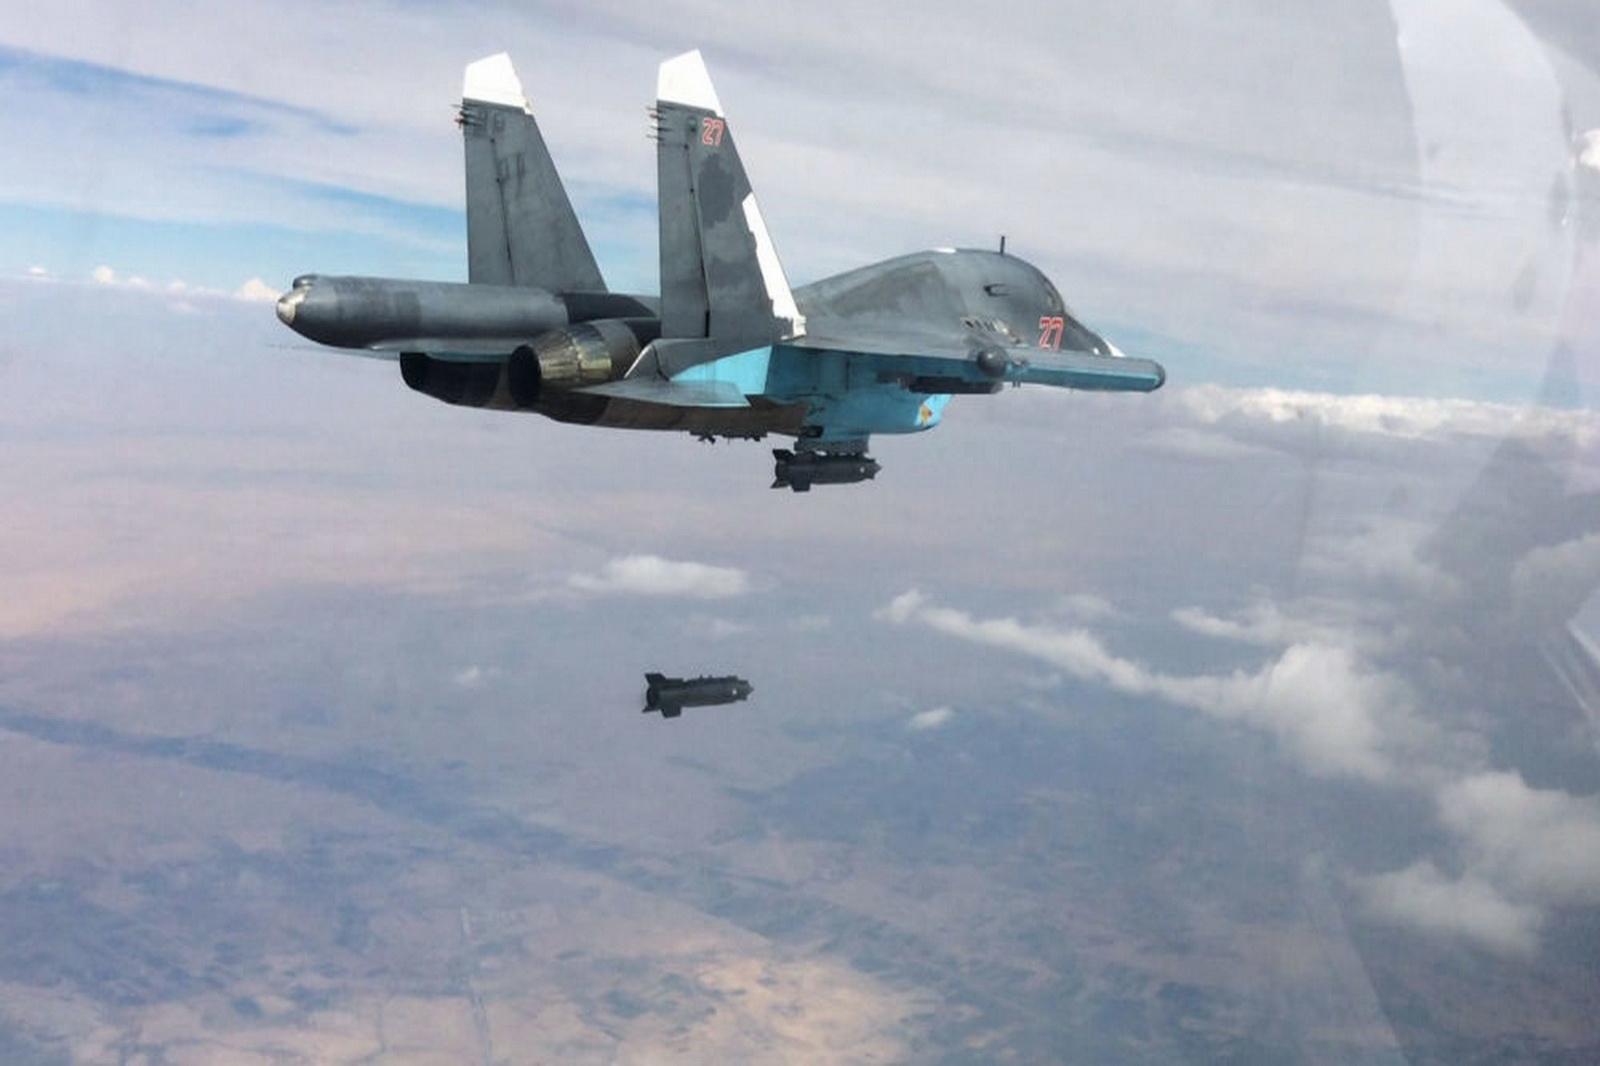 ob_40e88d_avions-russes5_resize.jpg